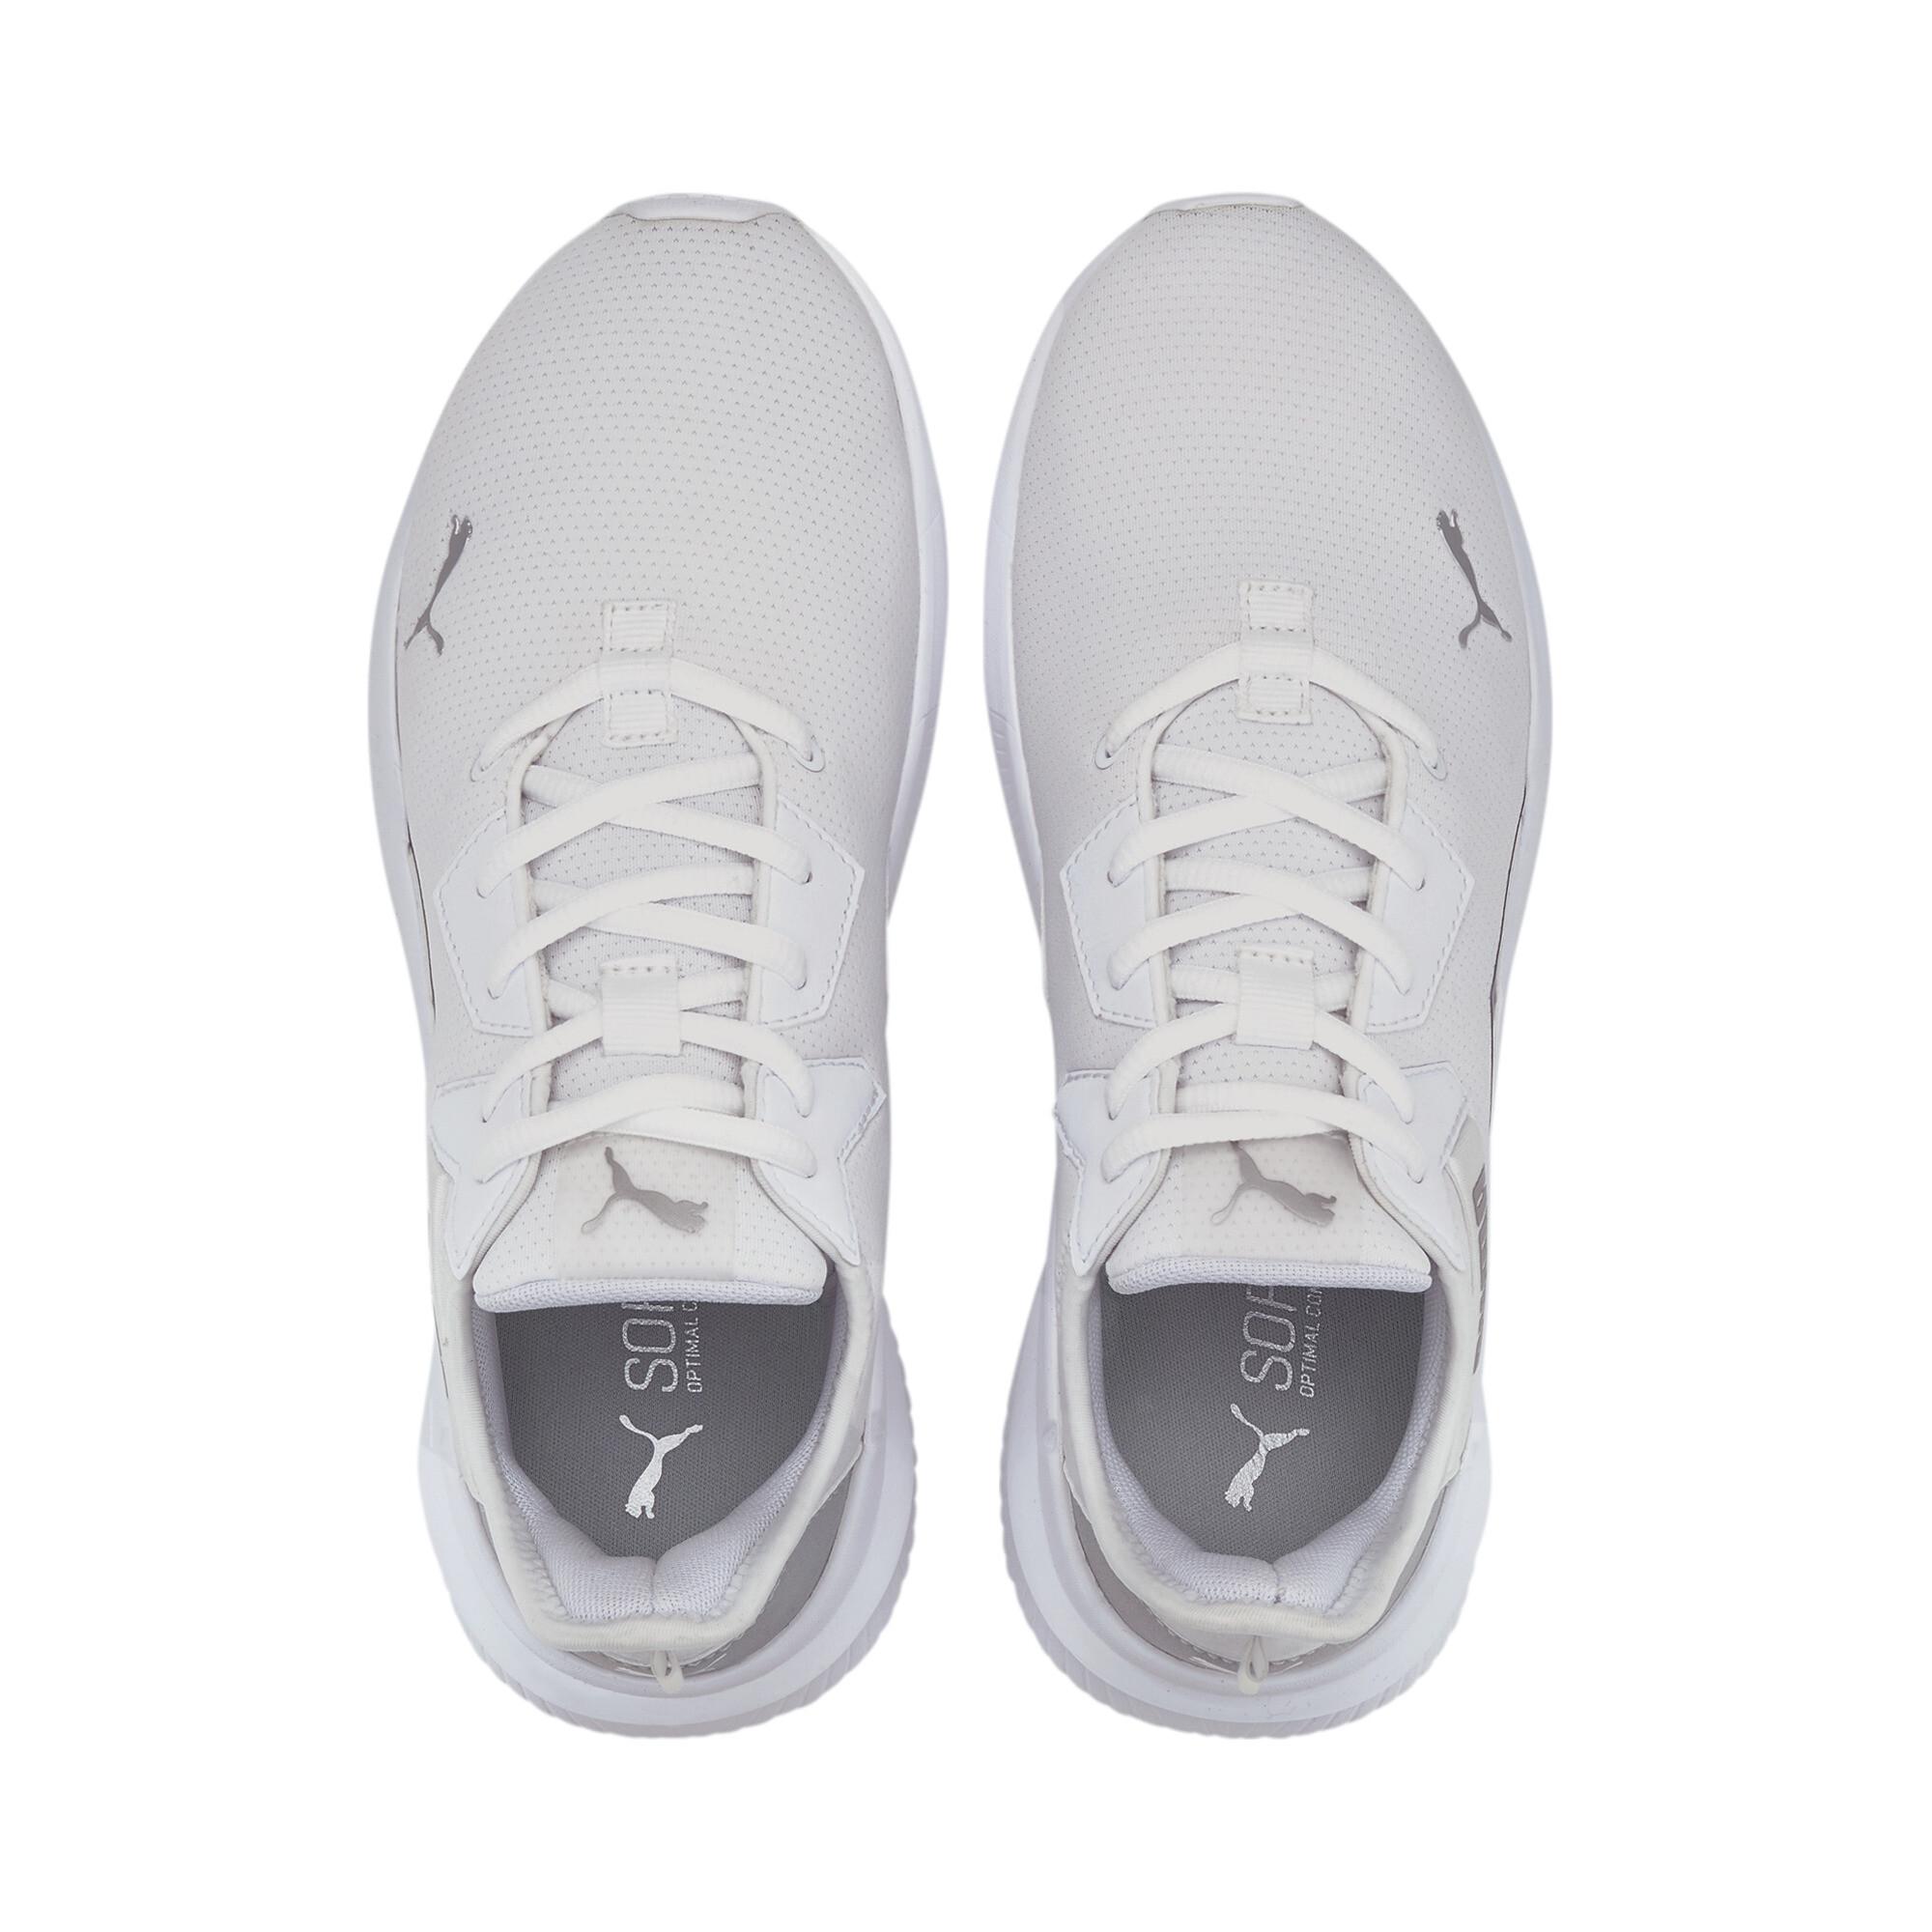 thumbnail 29 - PUMA-Women-039-s-Platinum-Training-Shoes